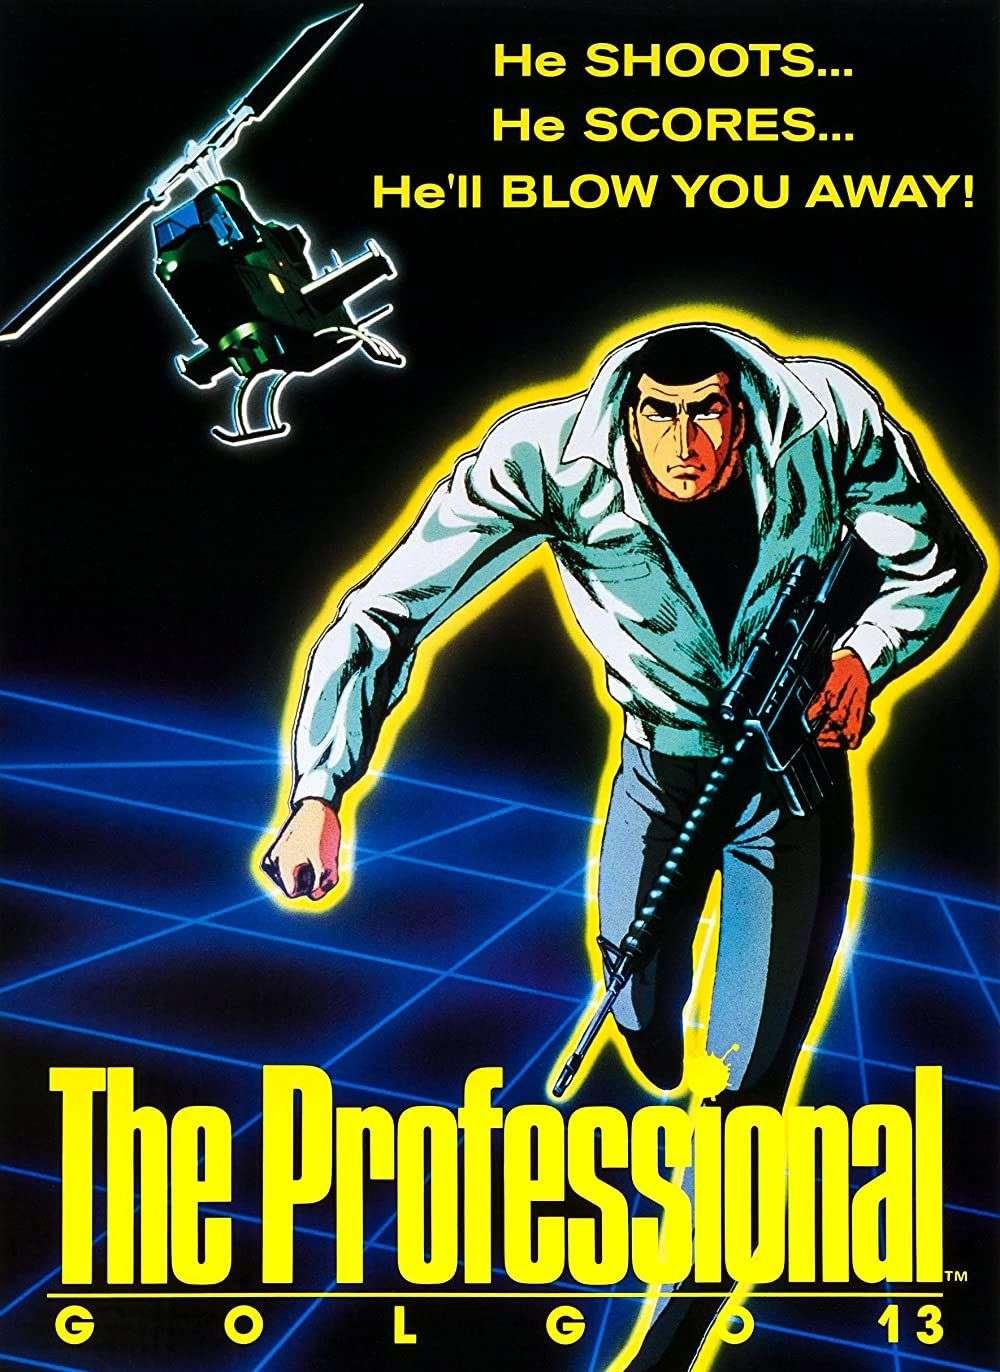 Golgo 13 The Professional (1983)